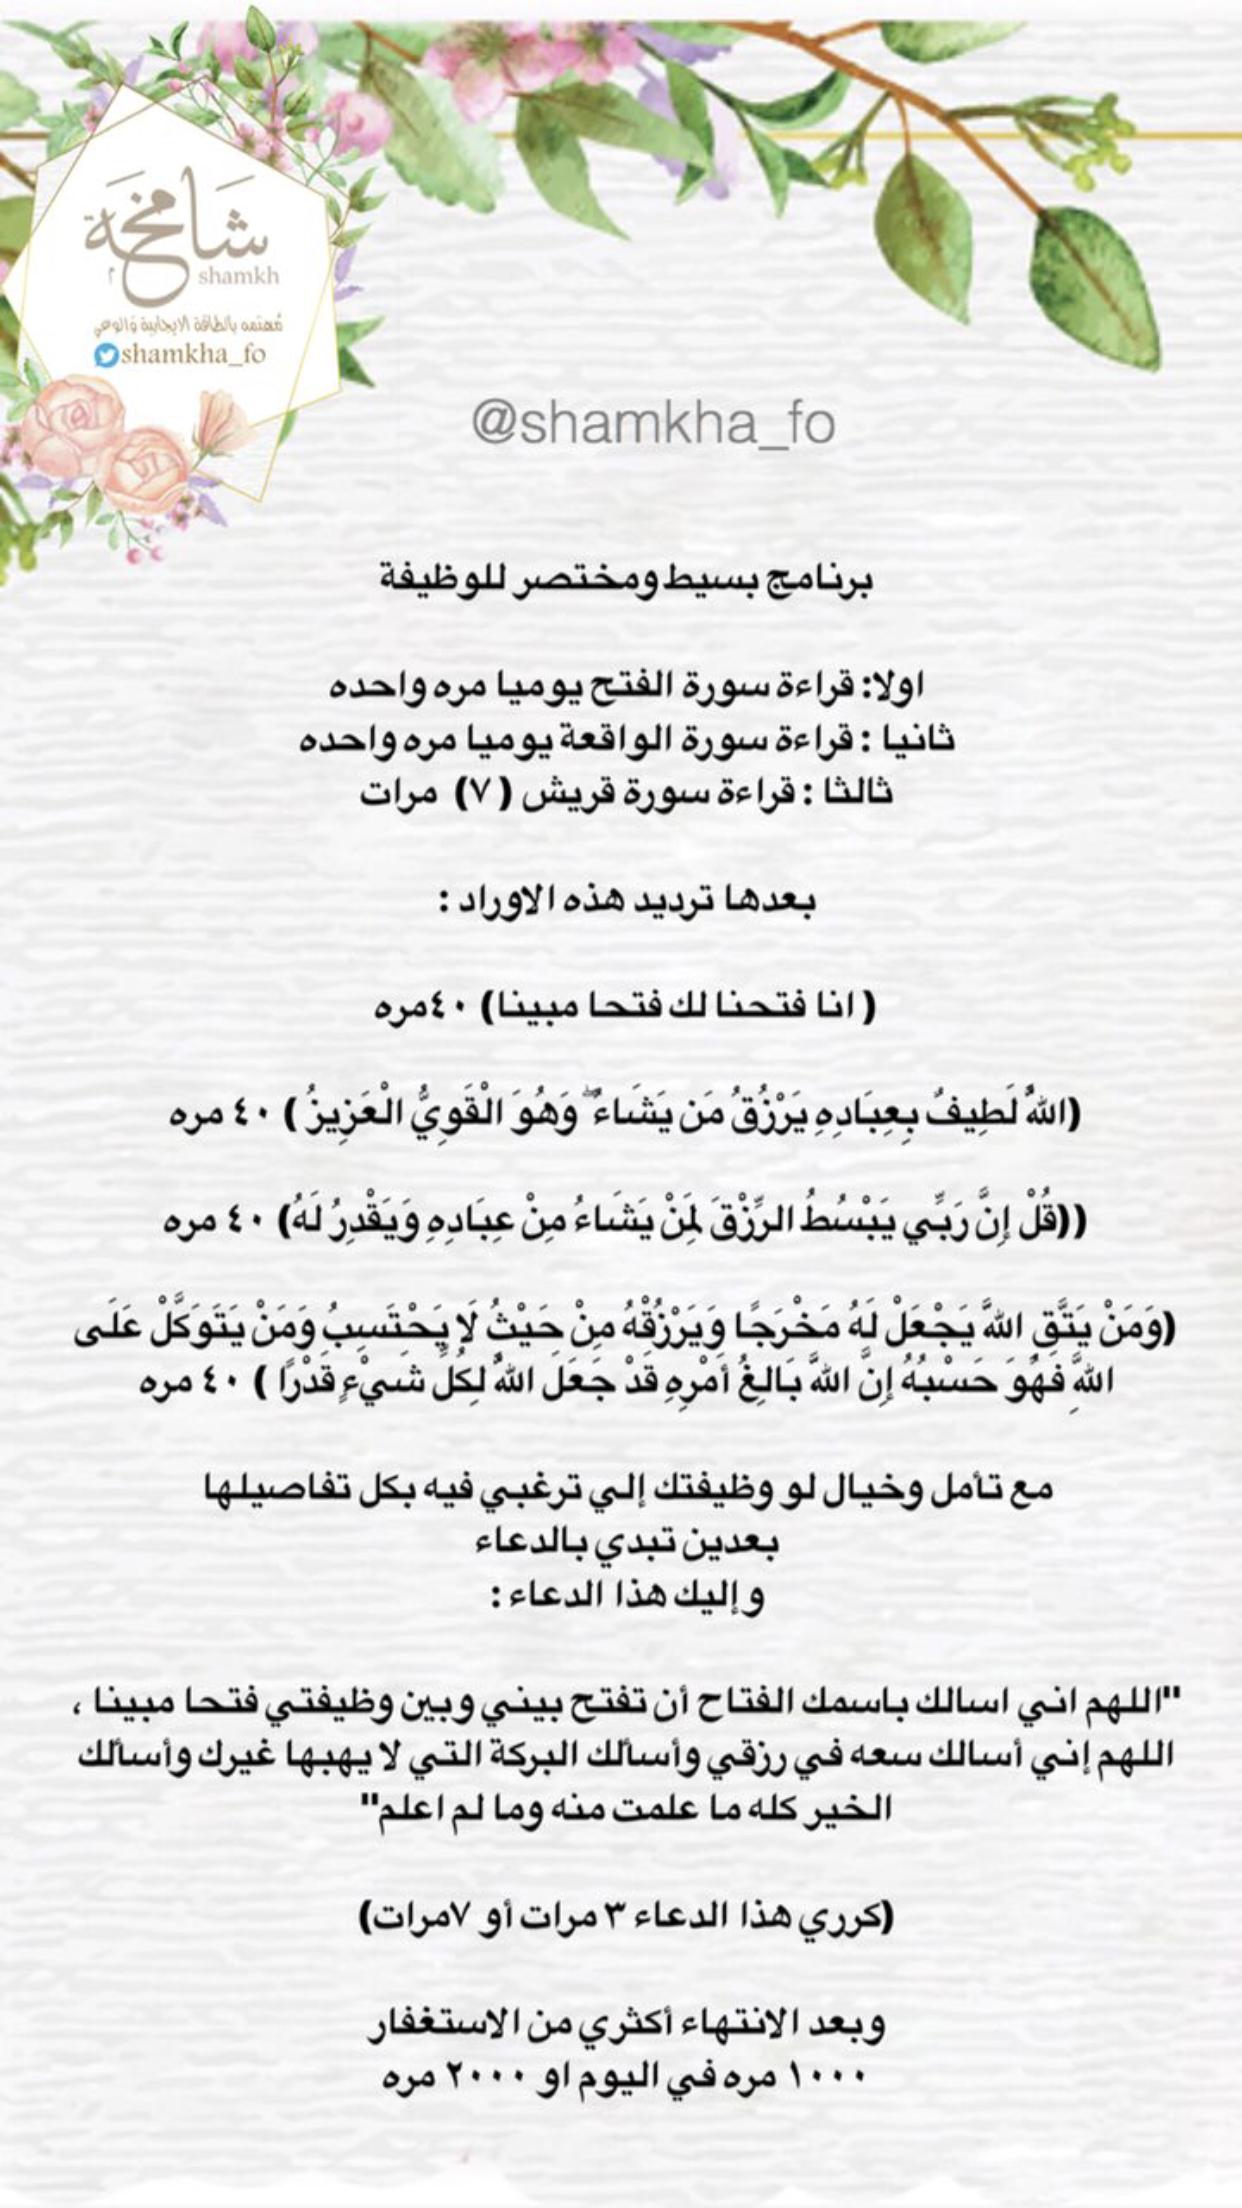 Pin By Basma Elbahrawy On Boska Islamic Phrases Islam Facts Islamic Inspirational Quotes